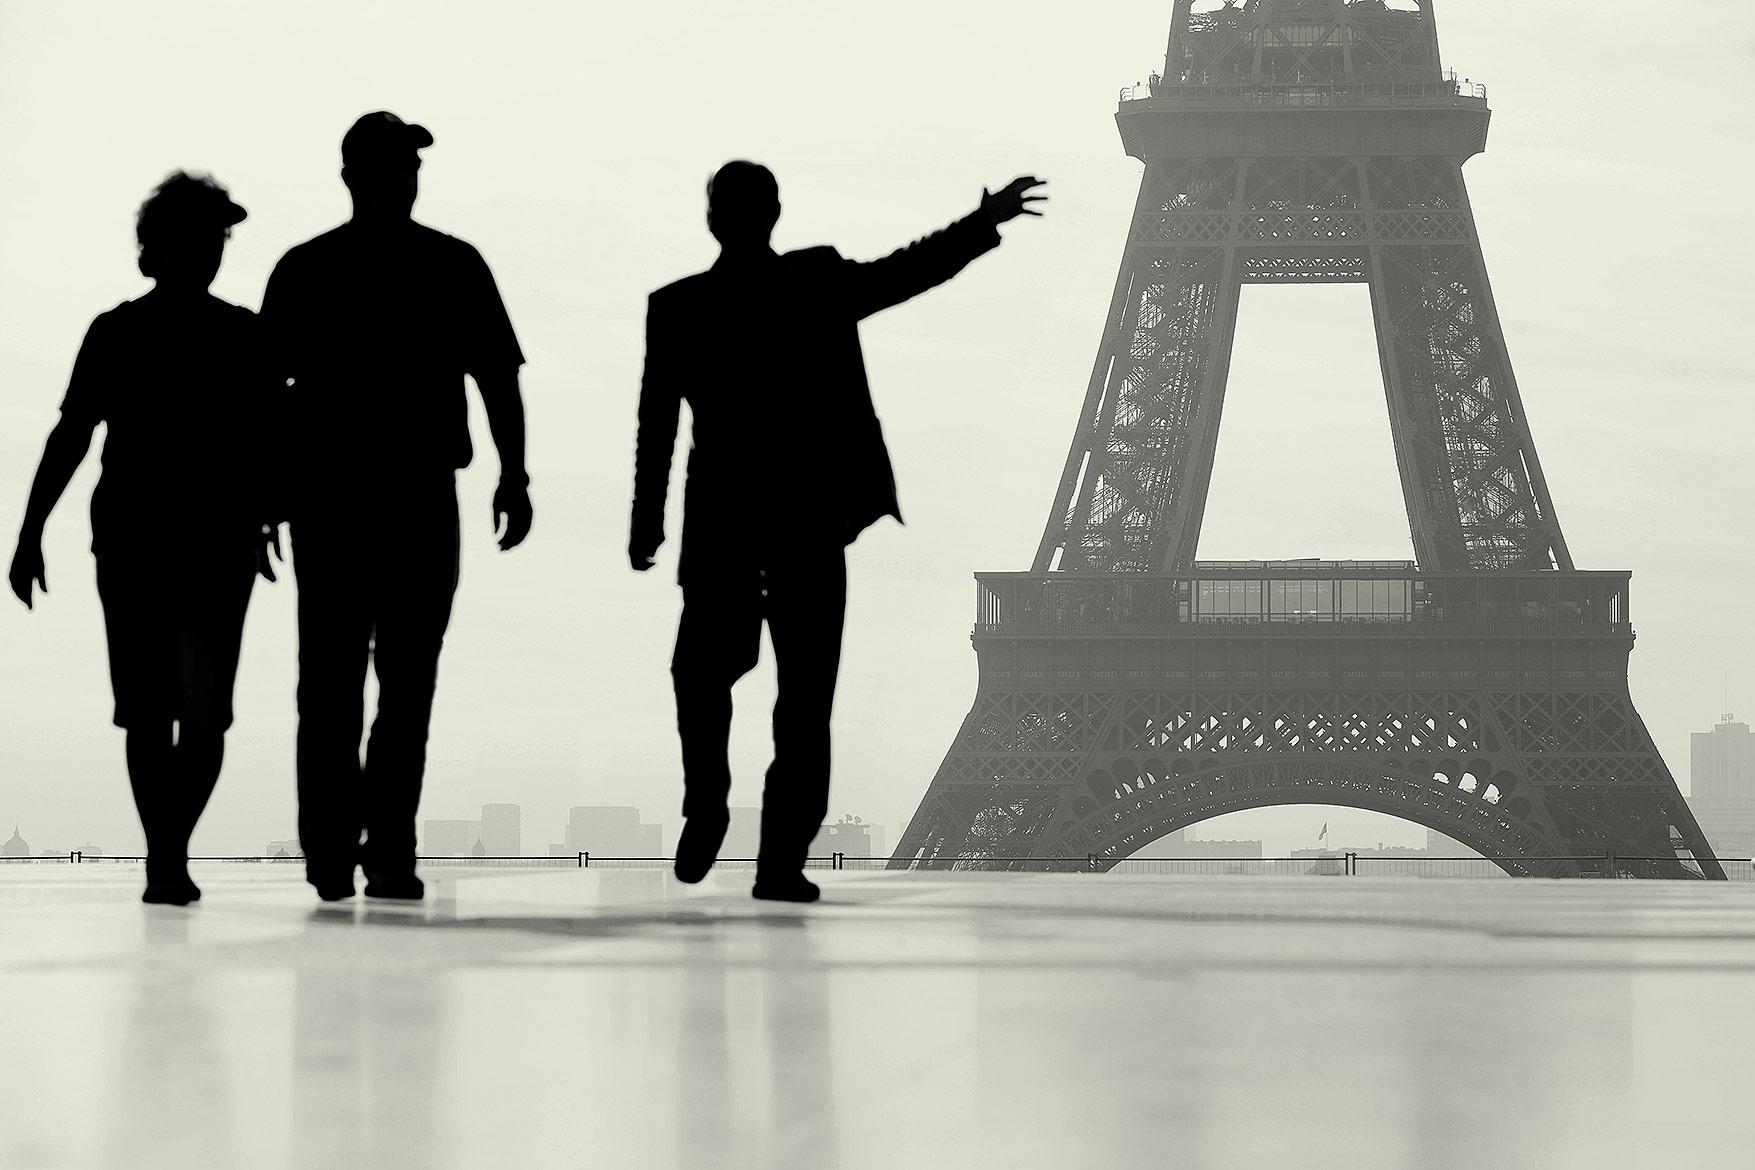 Easton_Paris_01.jpg